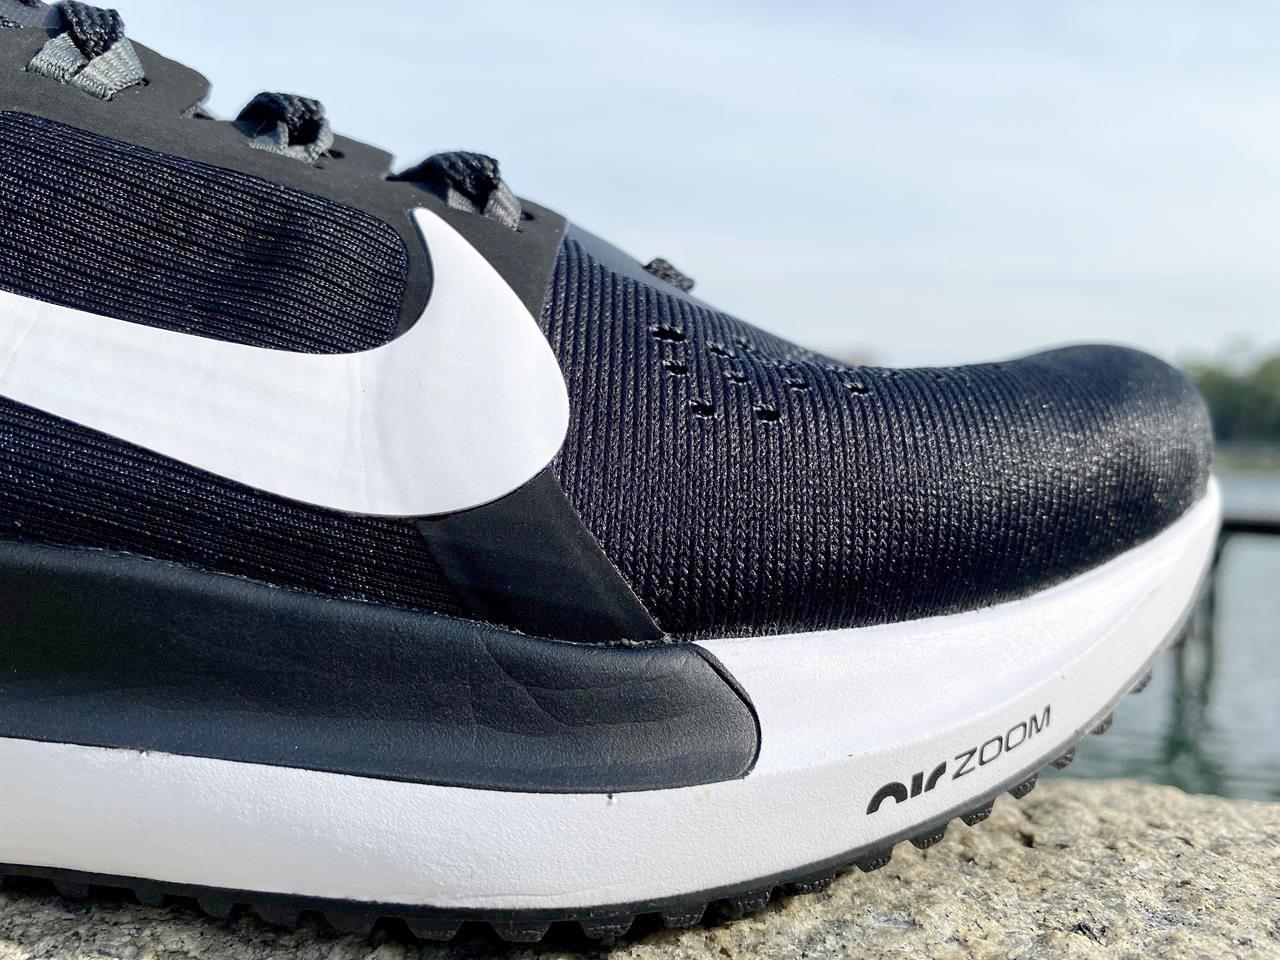 Nike Air Zoom Vomero 15 - Closeup